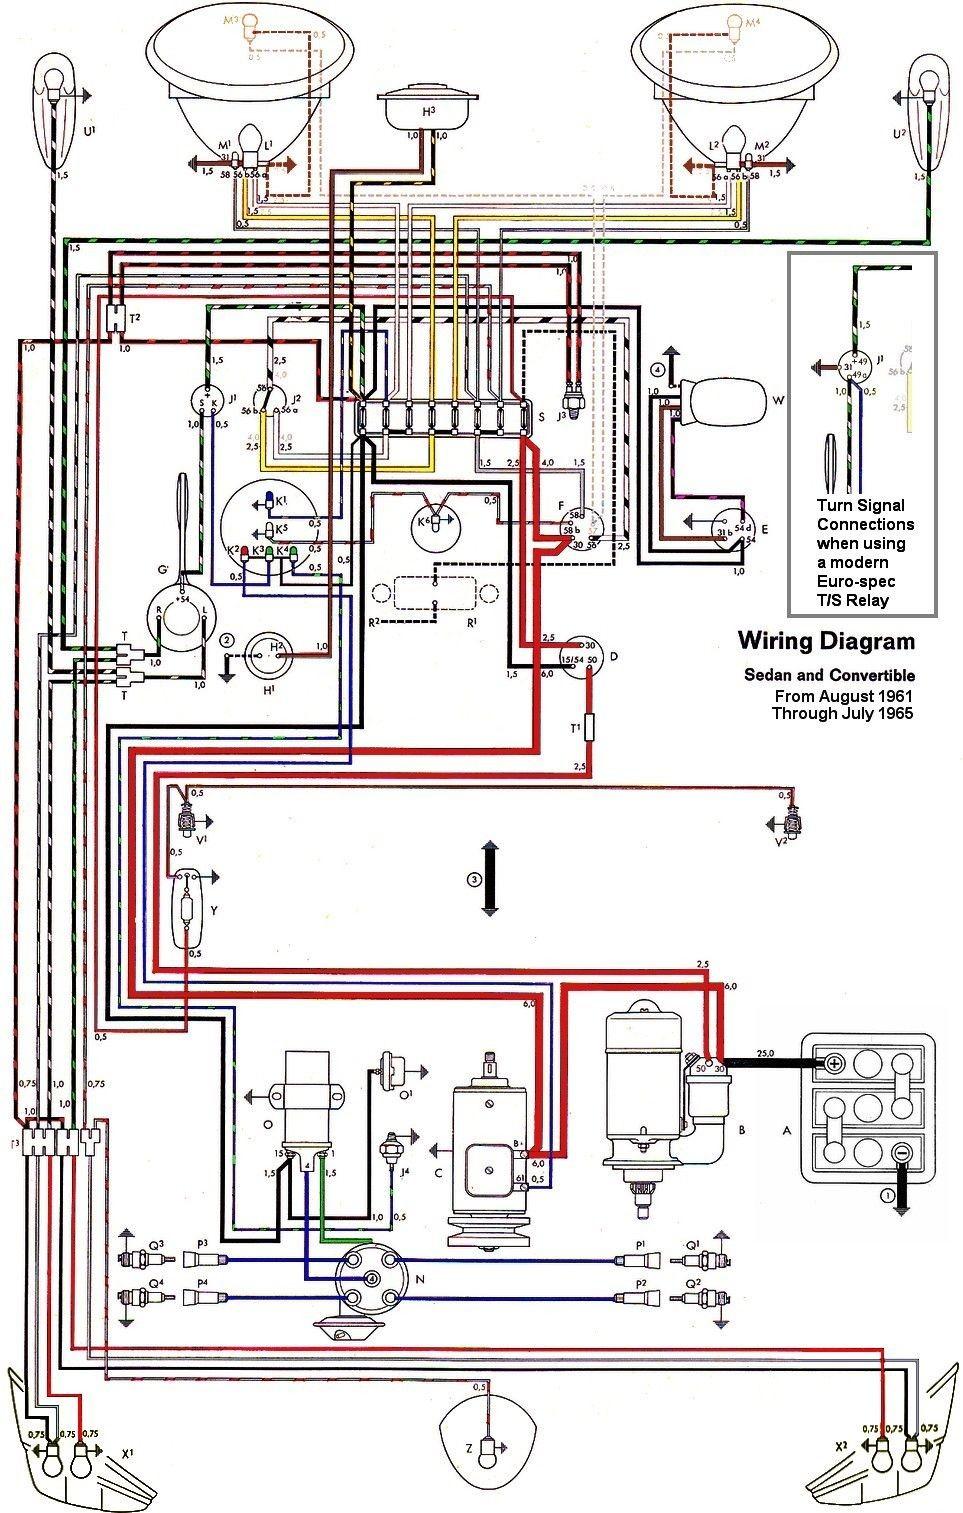 wiring diagram vw beetle sedan and convertible 1961 1965 vw rh pinterest